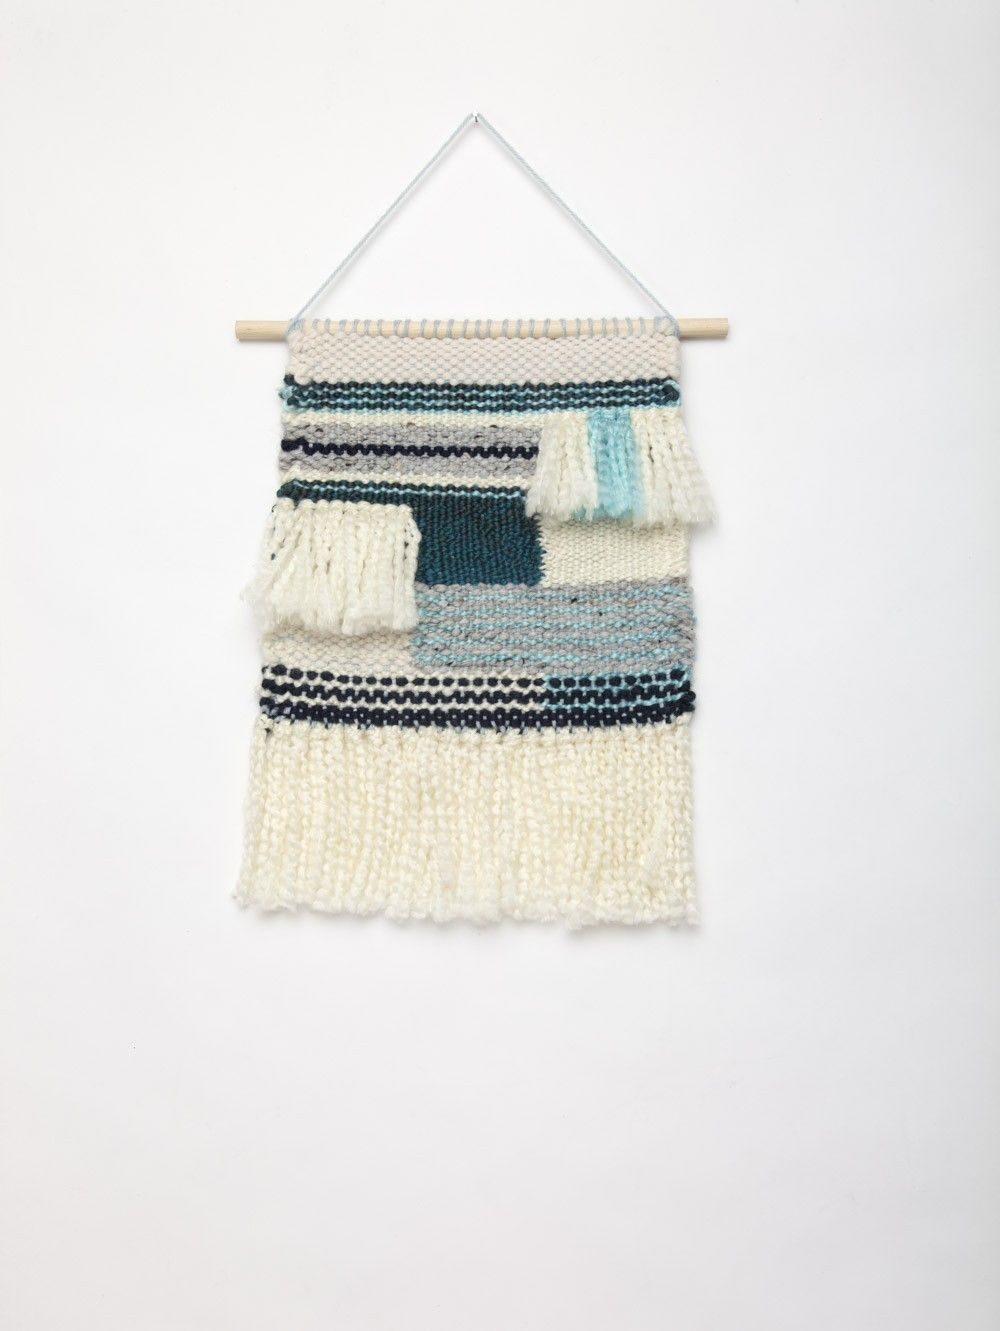 Weave Kit - Clear Skies Wall Hanging | Weaving | Pinterest